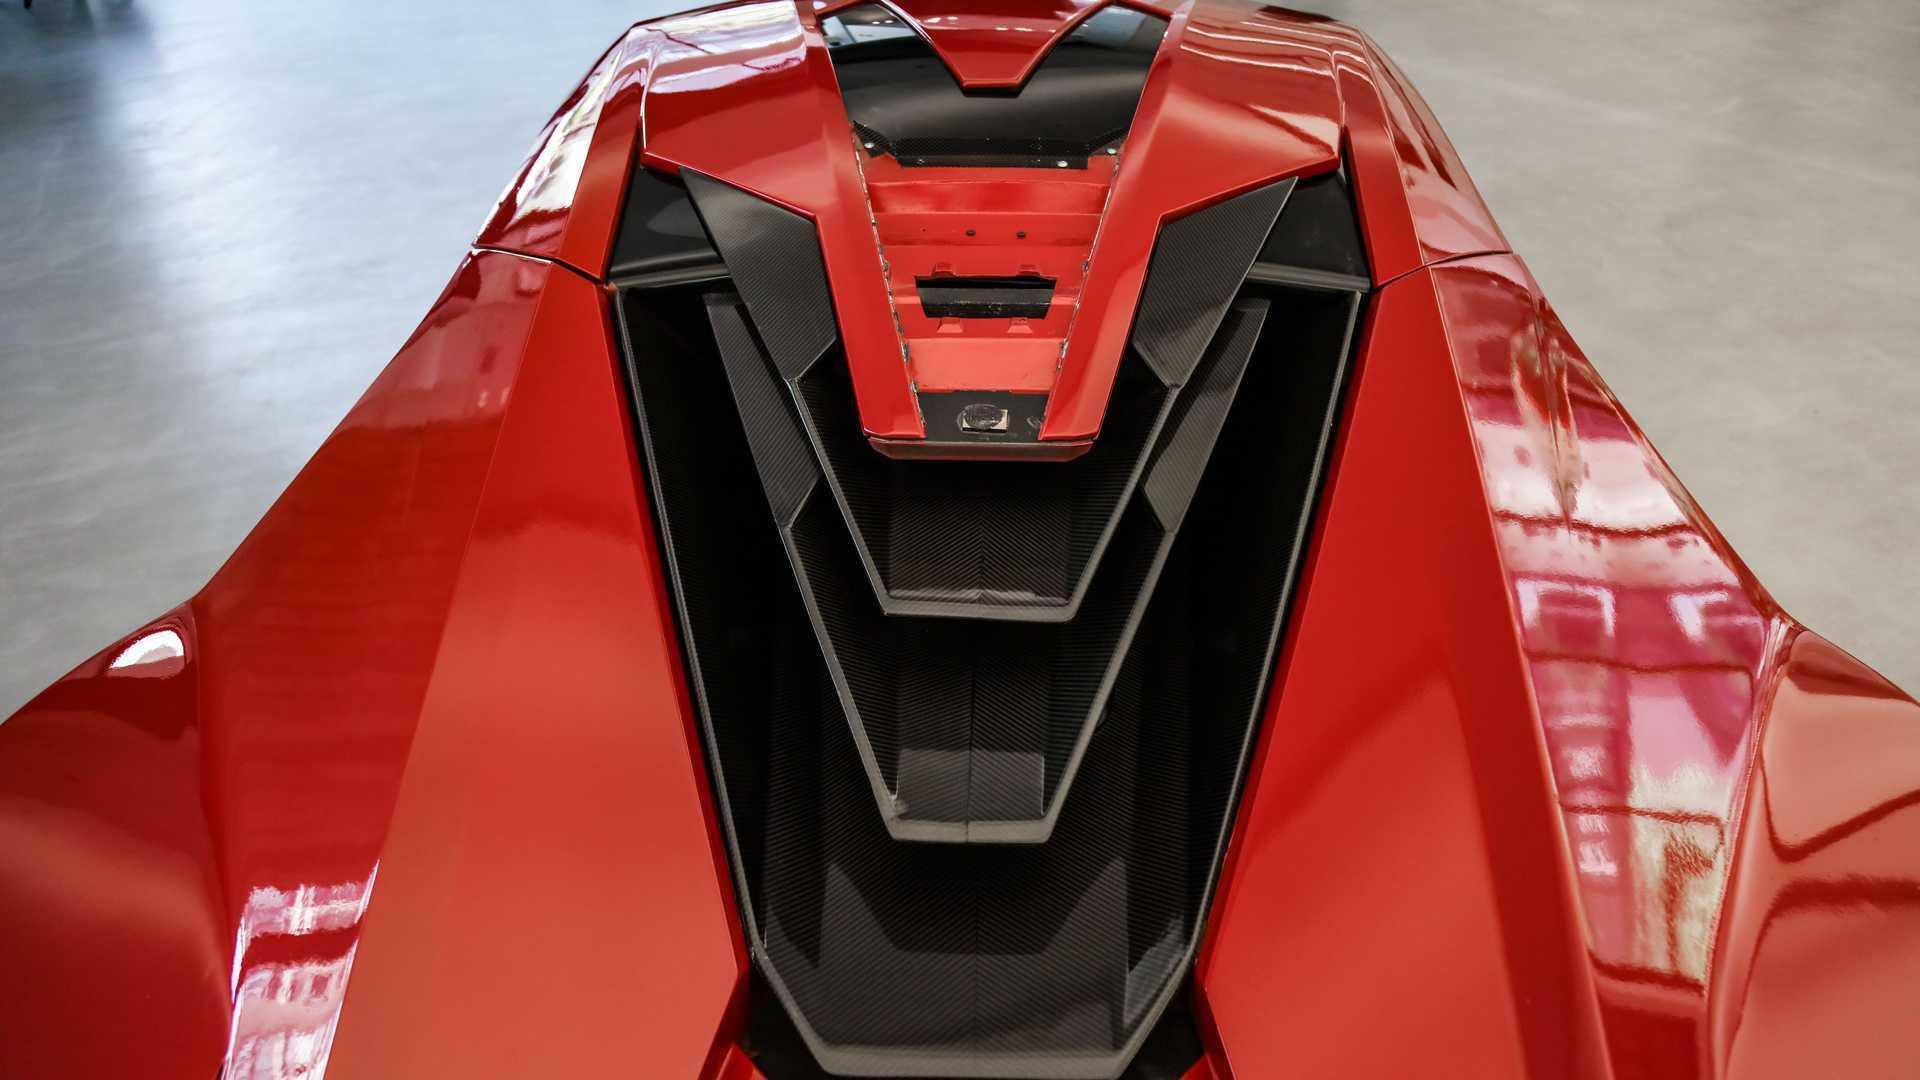 Lykan_HyperSport_stunt_car_sale-0017